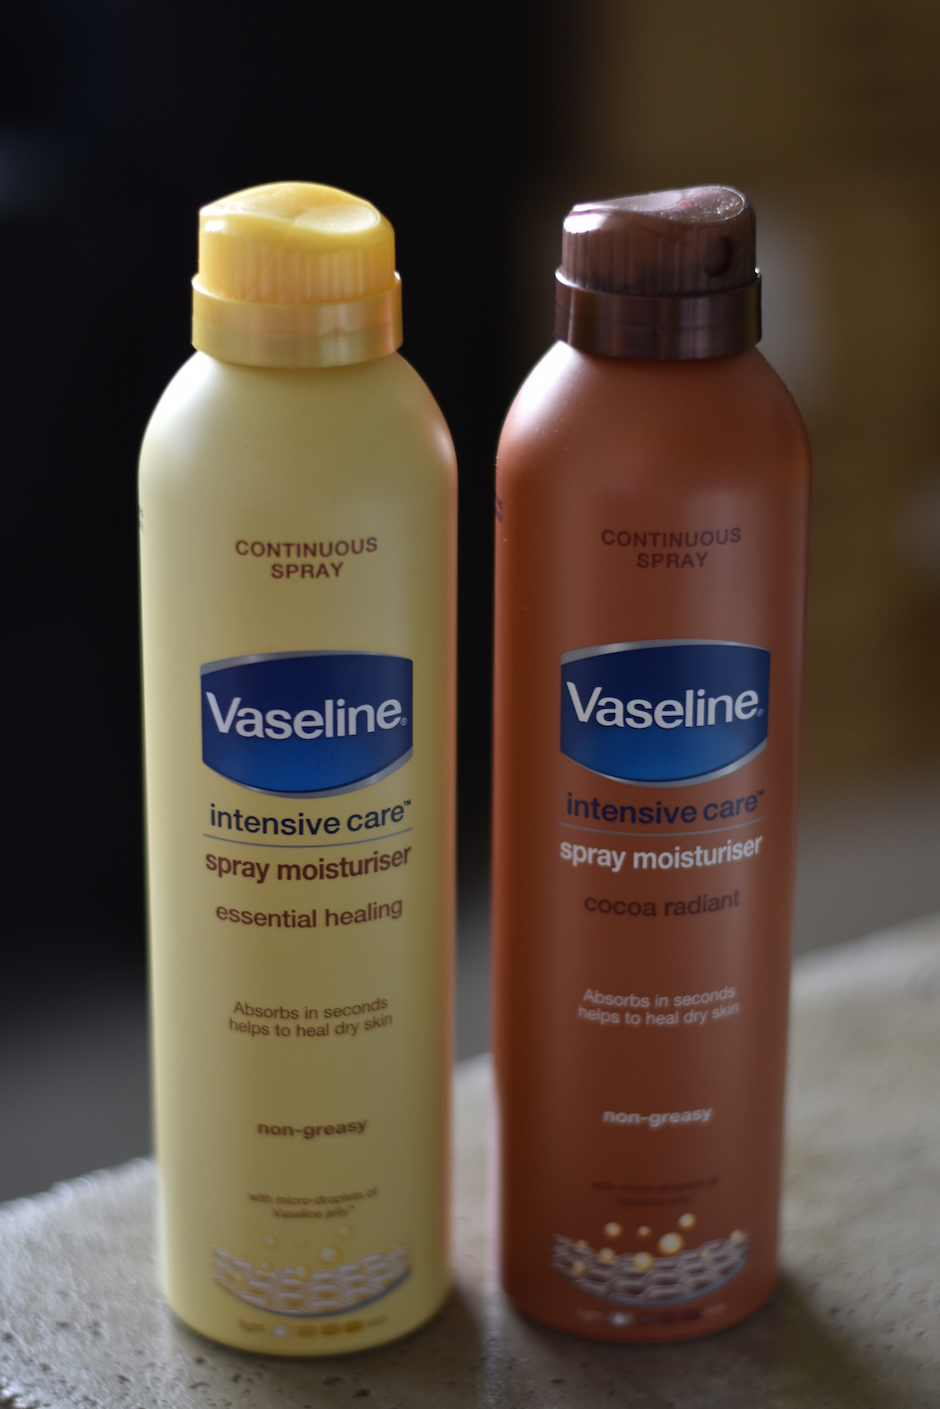 Vaseline Spray Moisturiser